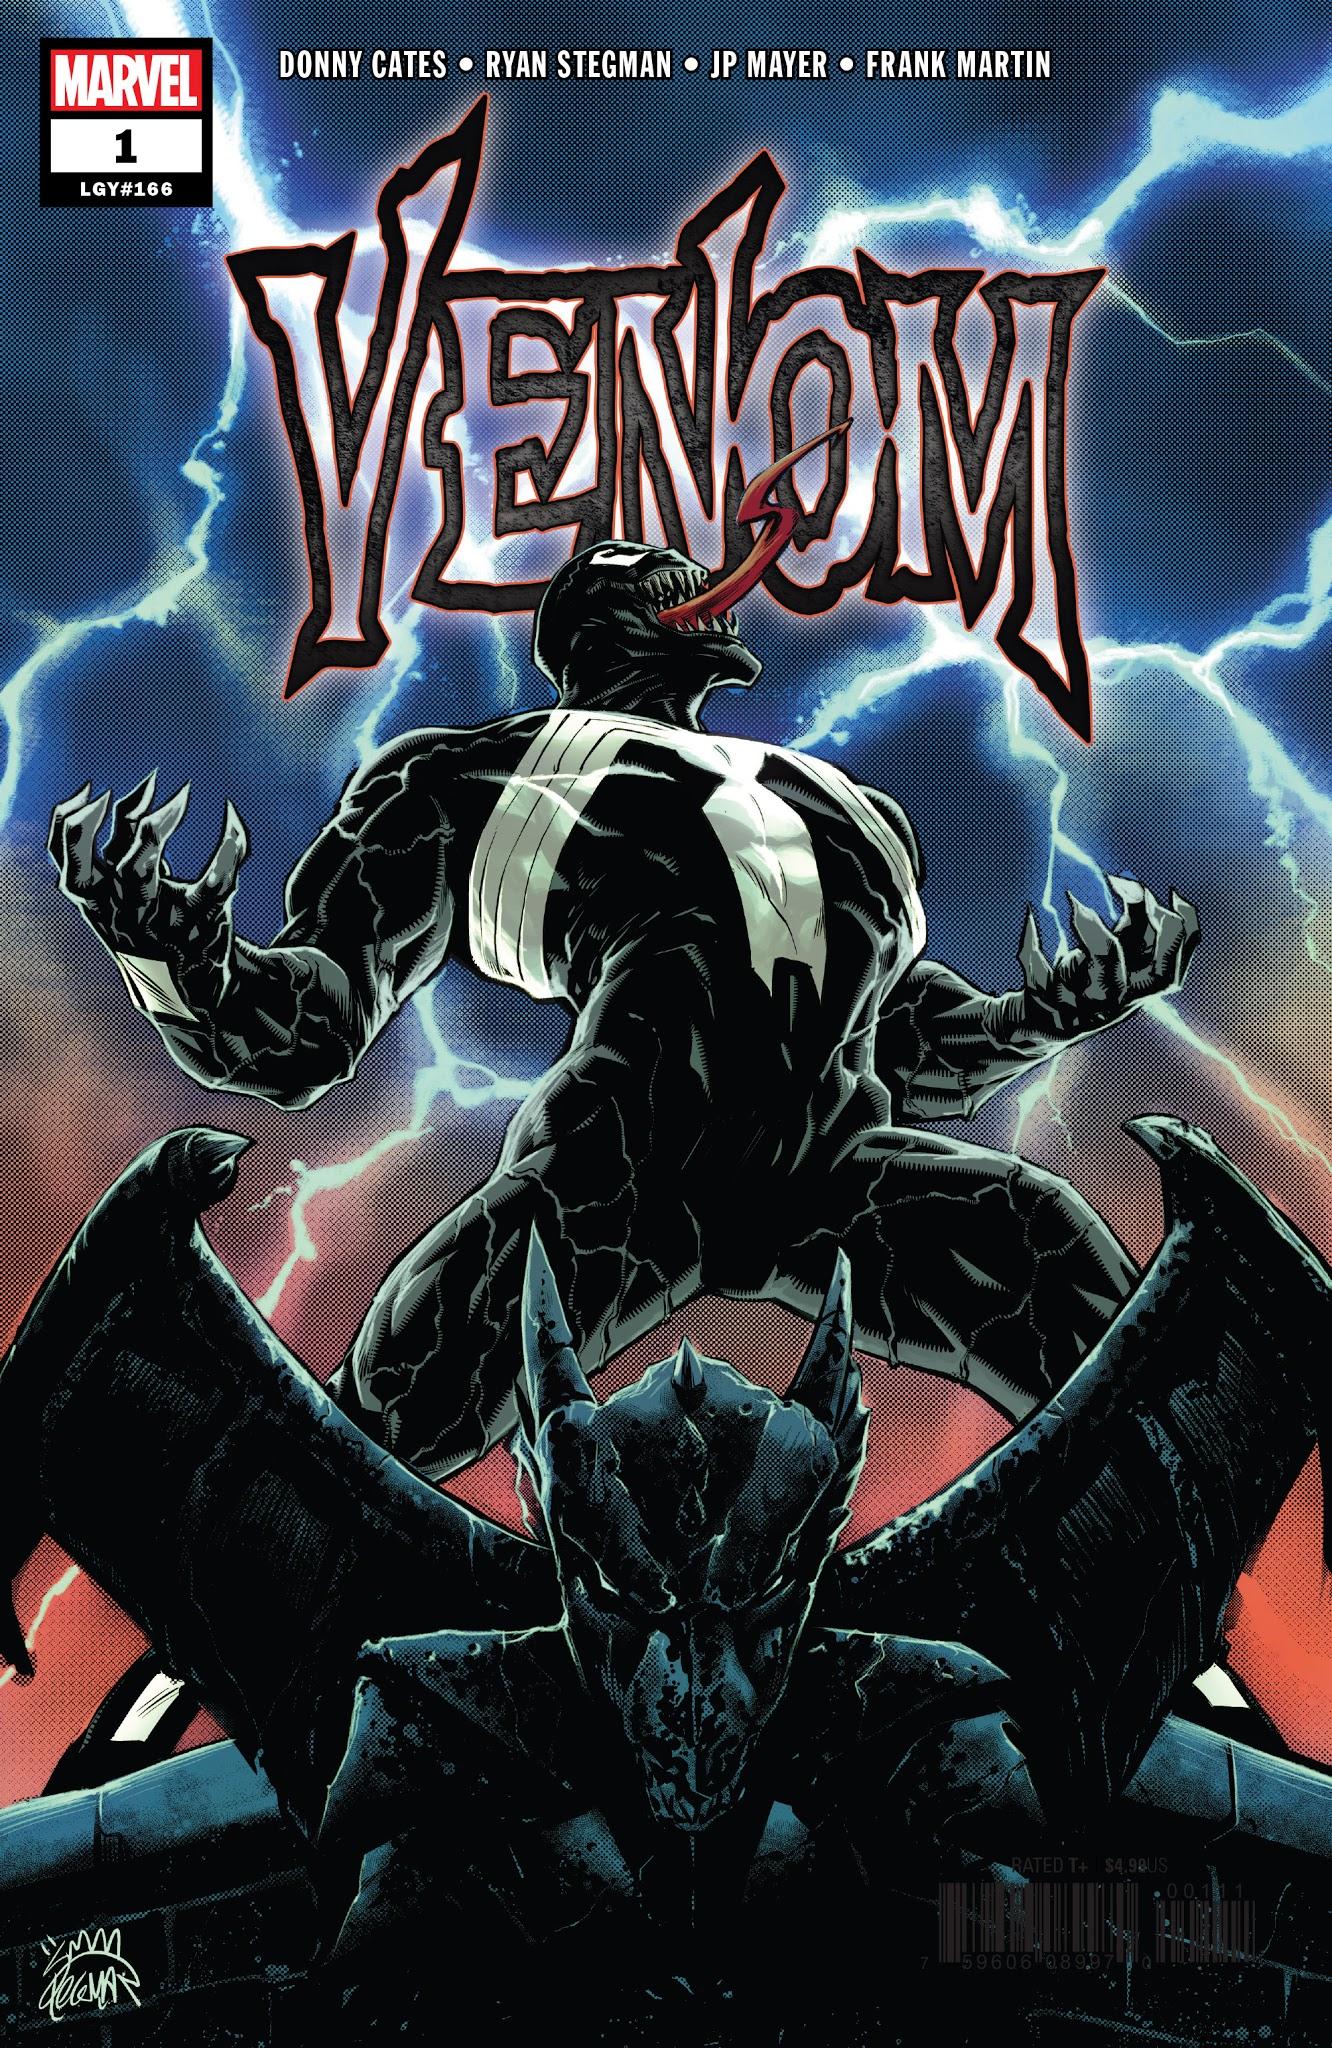 Venom (2018) 1 Page 1